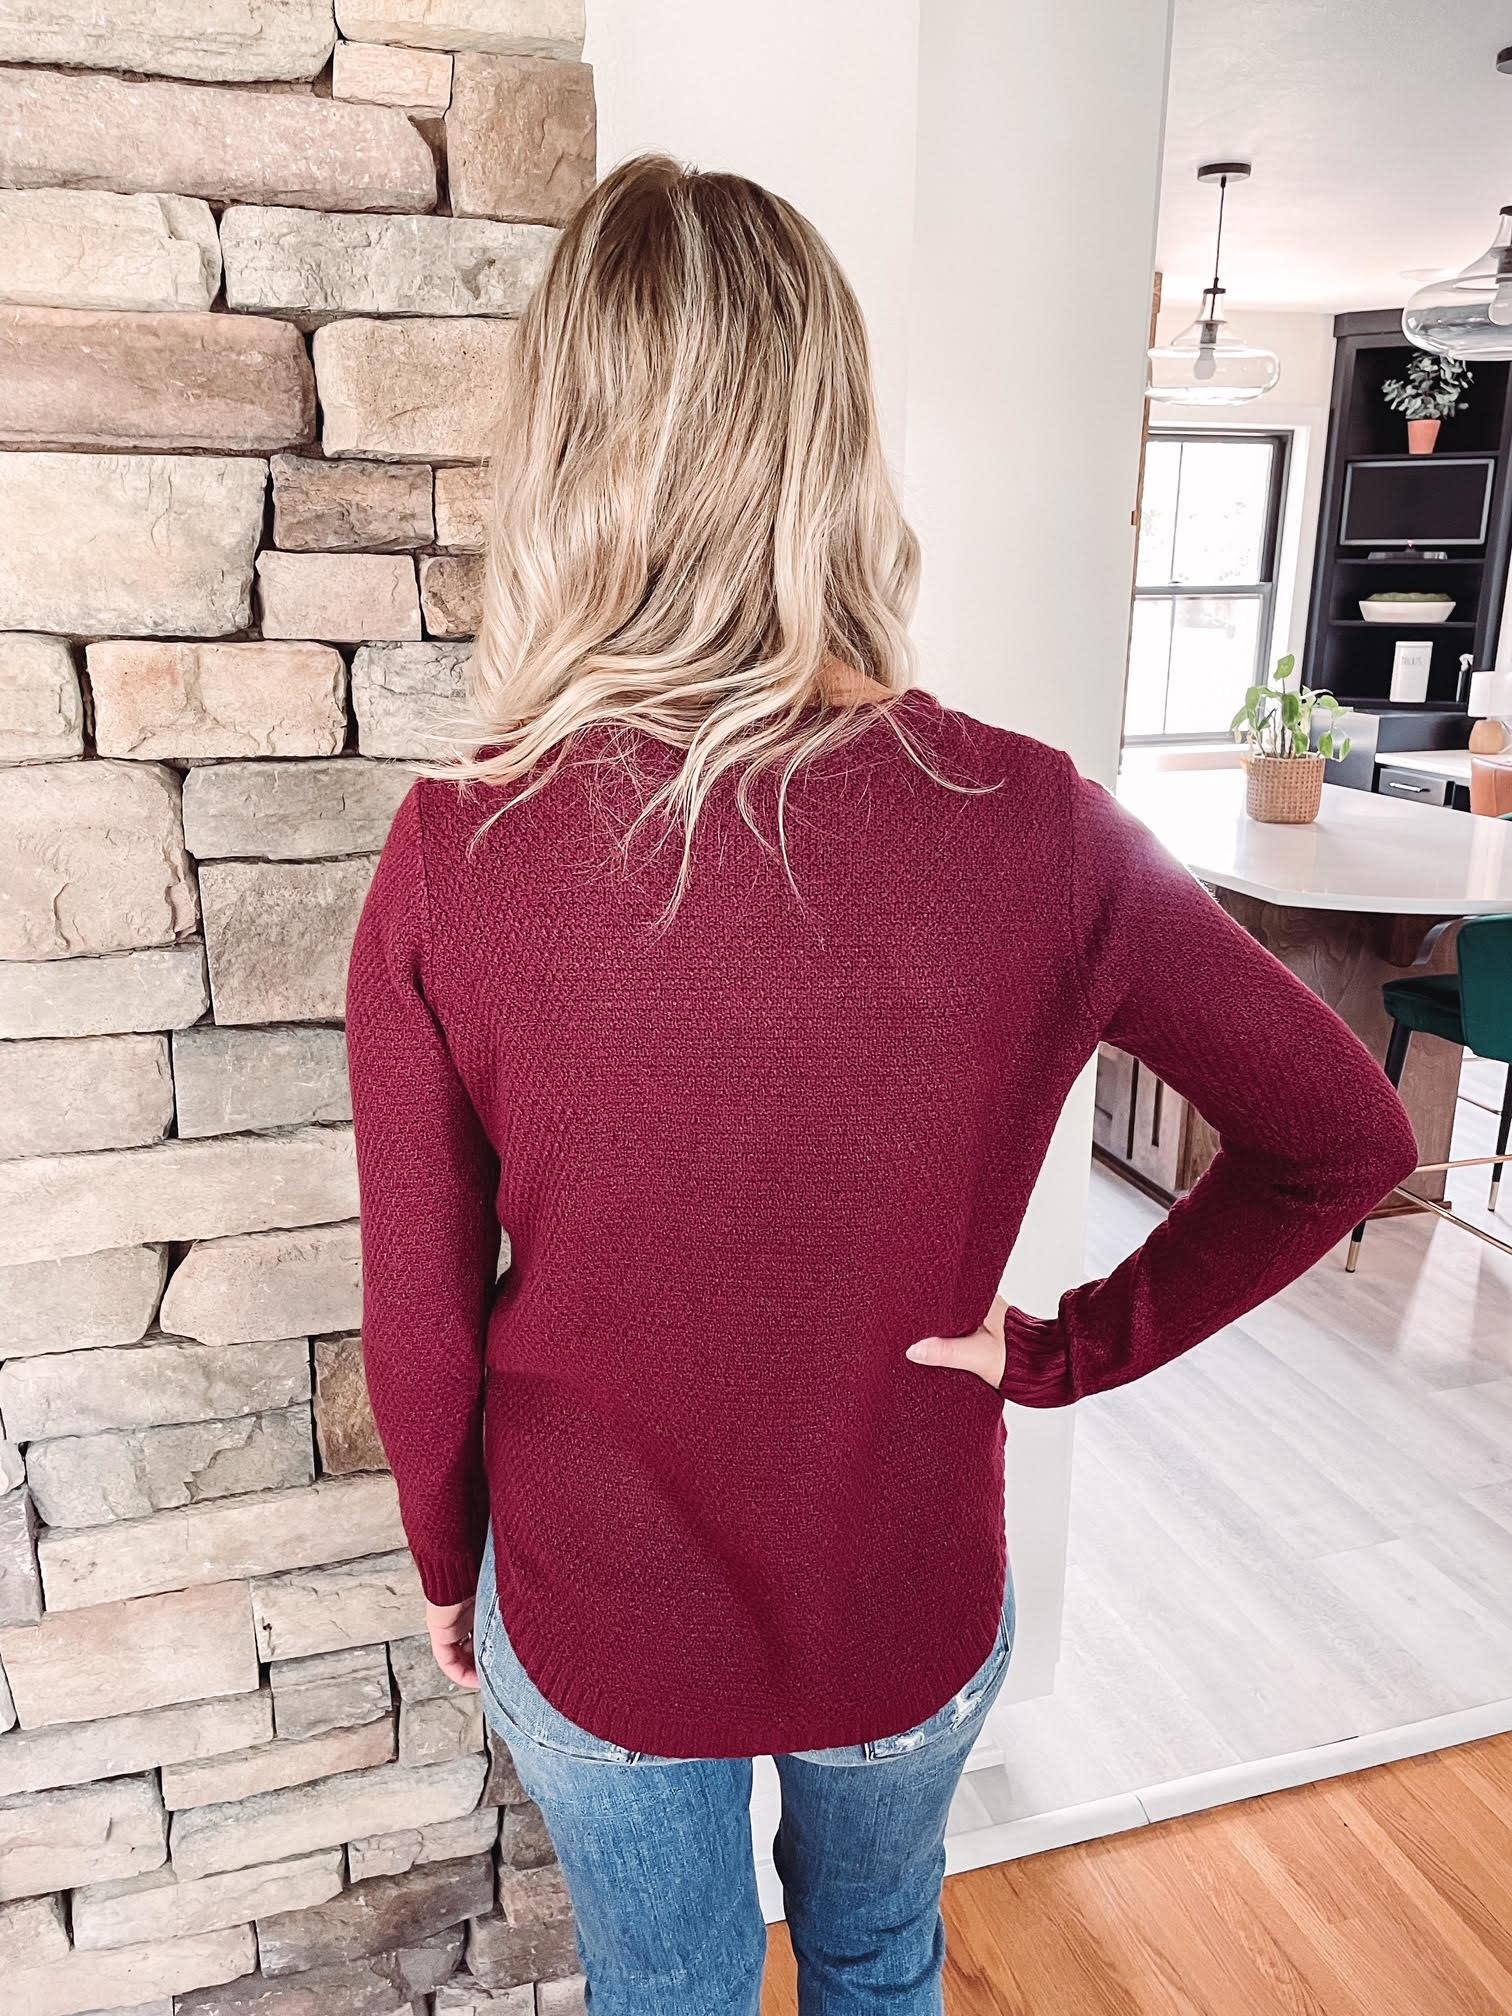 Alexa Scarlet Sweater